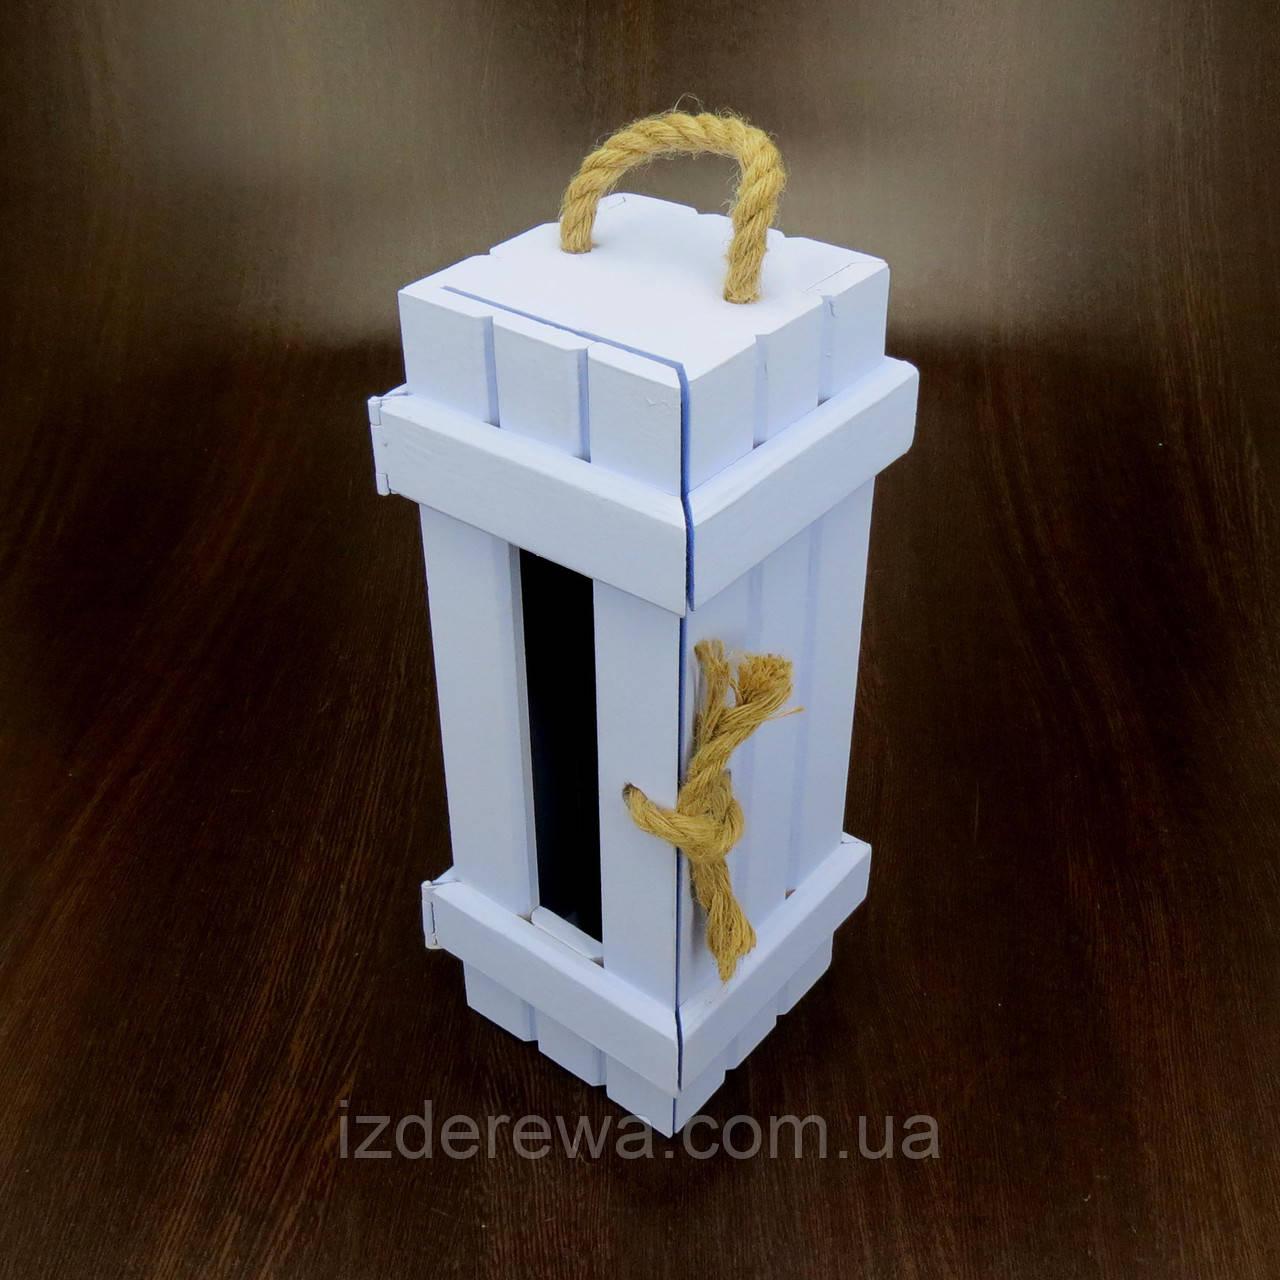 "Подарочная коробка ""Верона"" ирис"